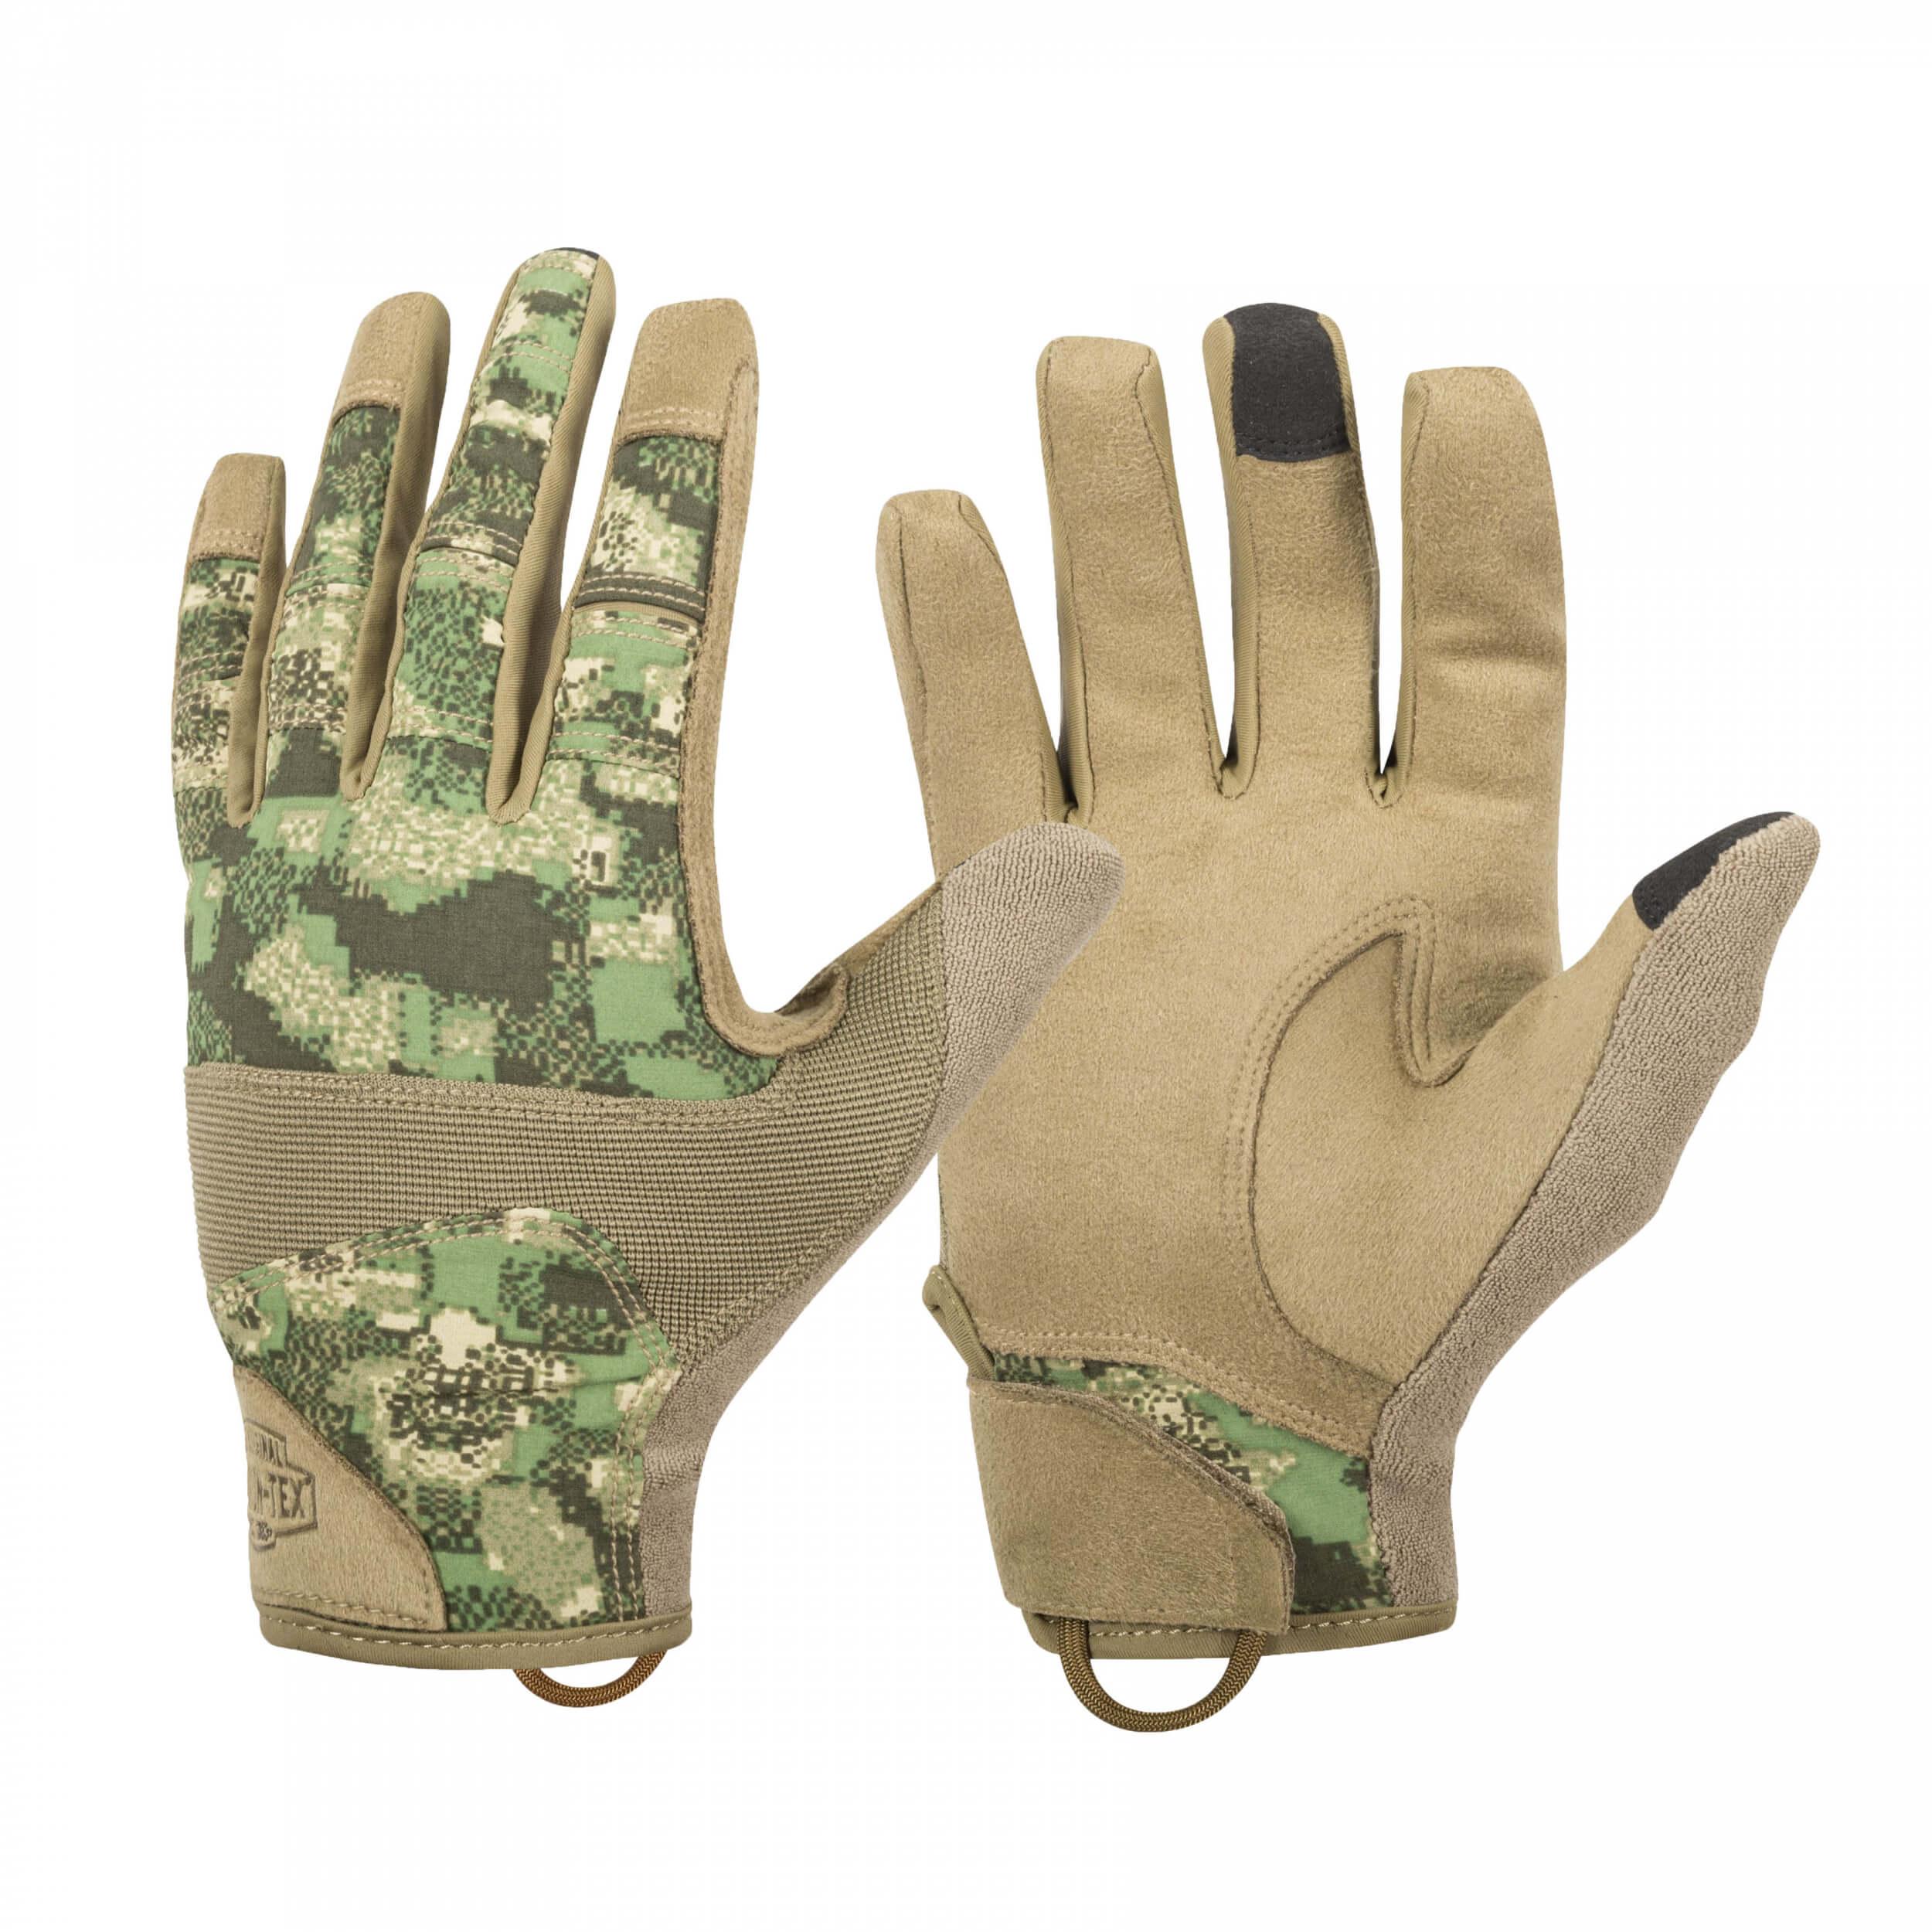 Helikon-Tex Range Tactical Gloves Hard - PenCott Wildwood / Coyote A